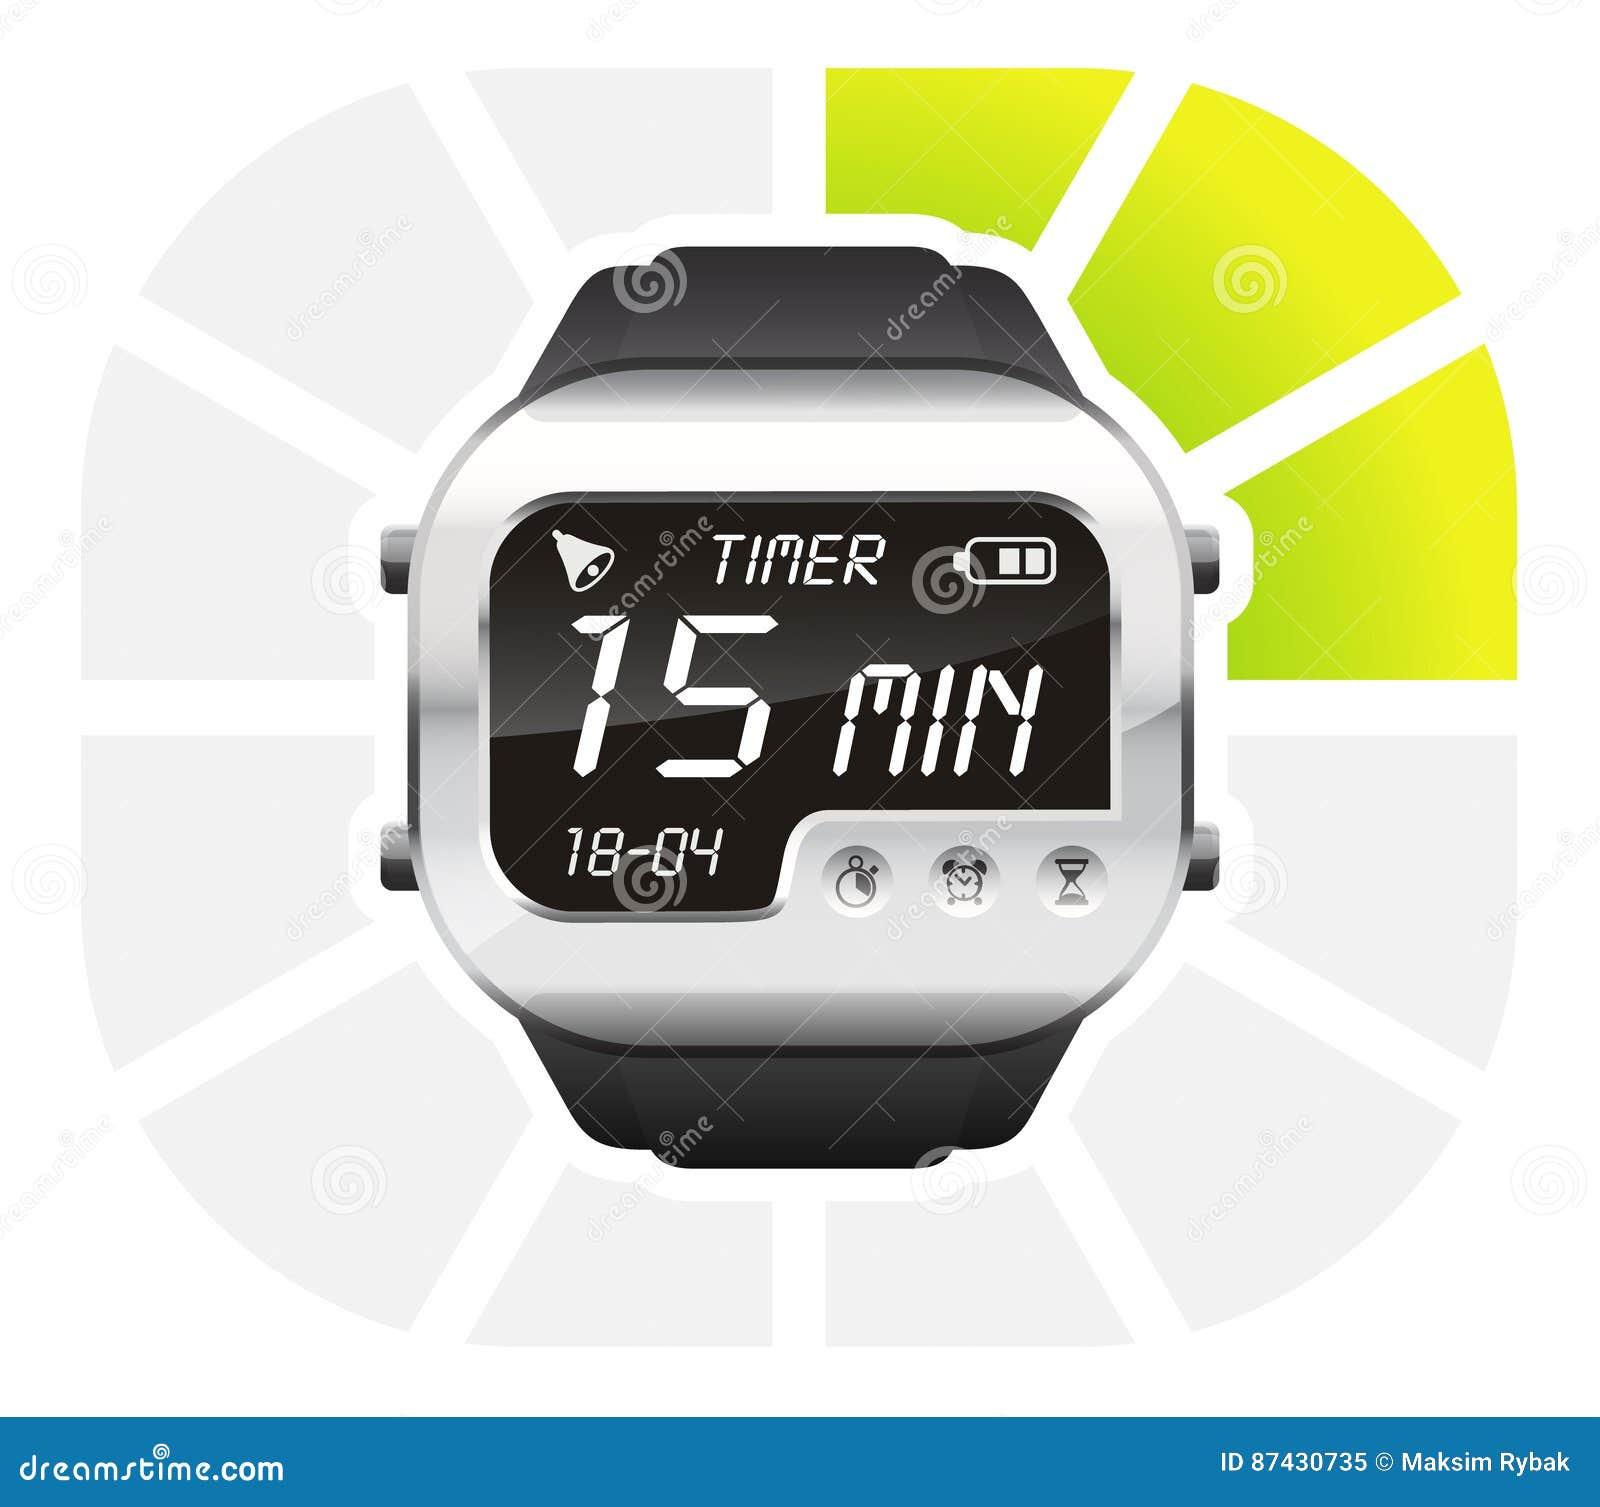 digital watch timer 15 minutes stock vector illustration of vector